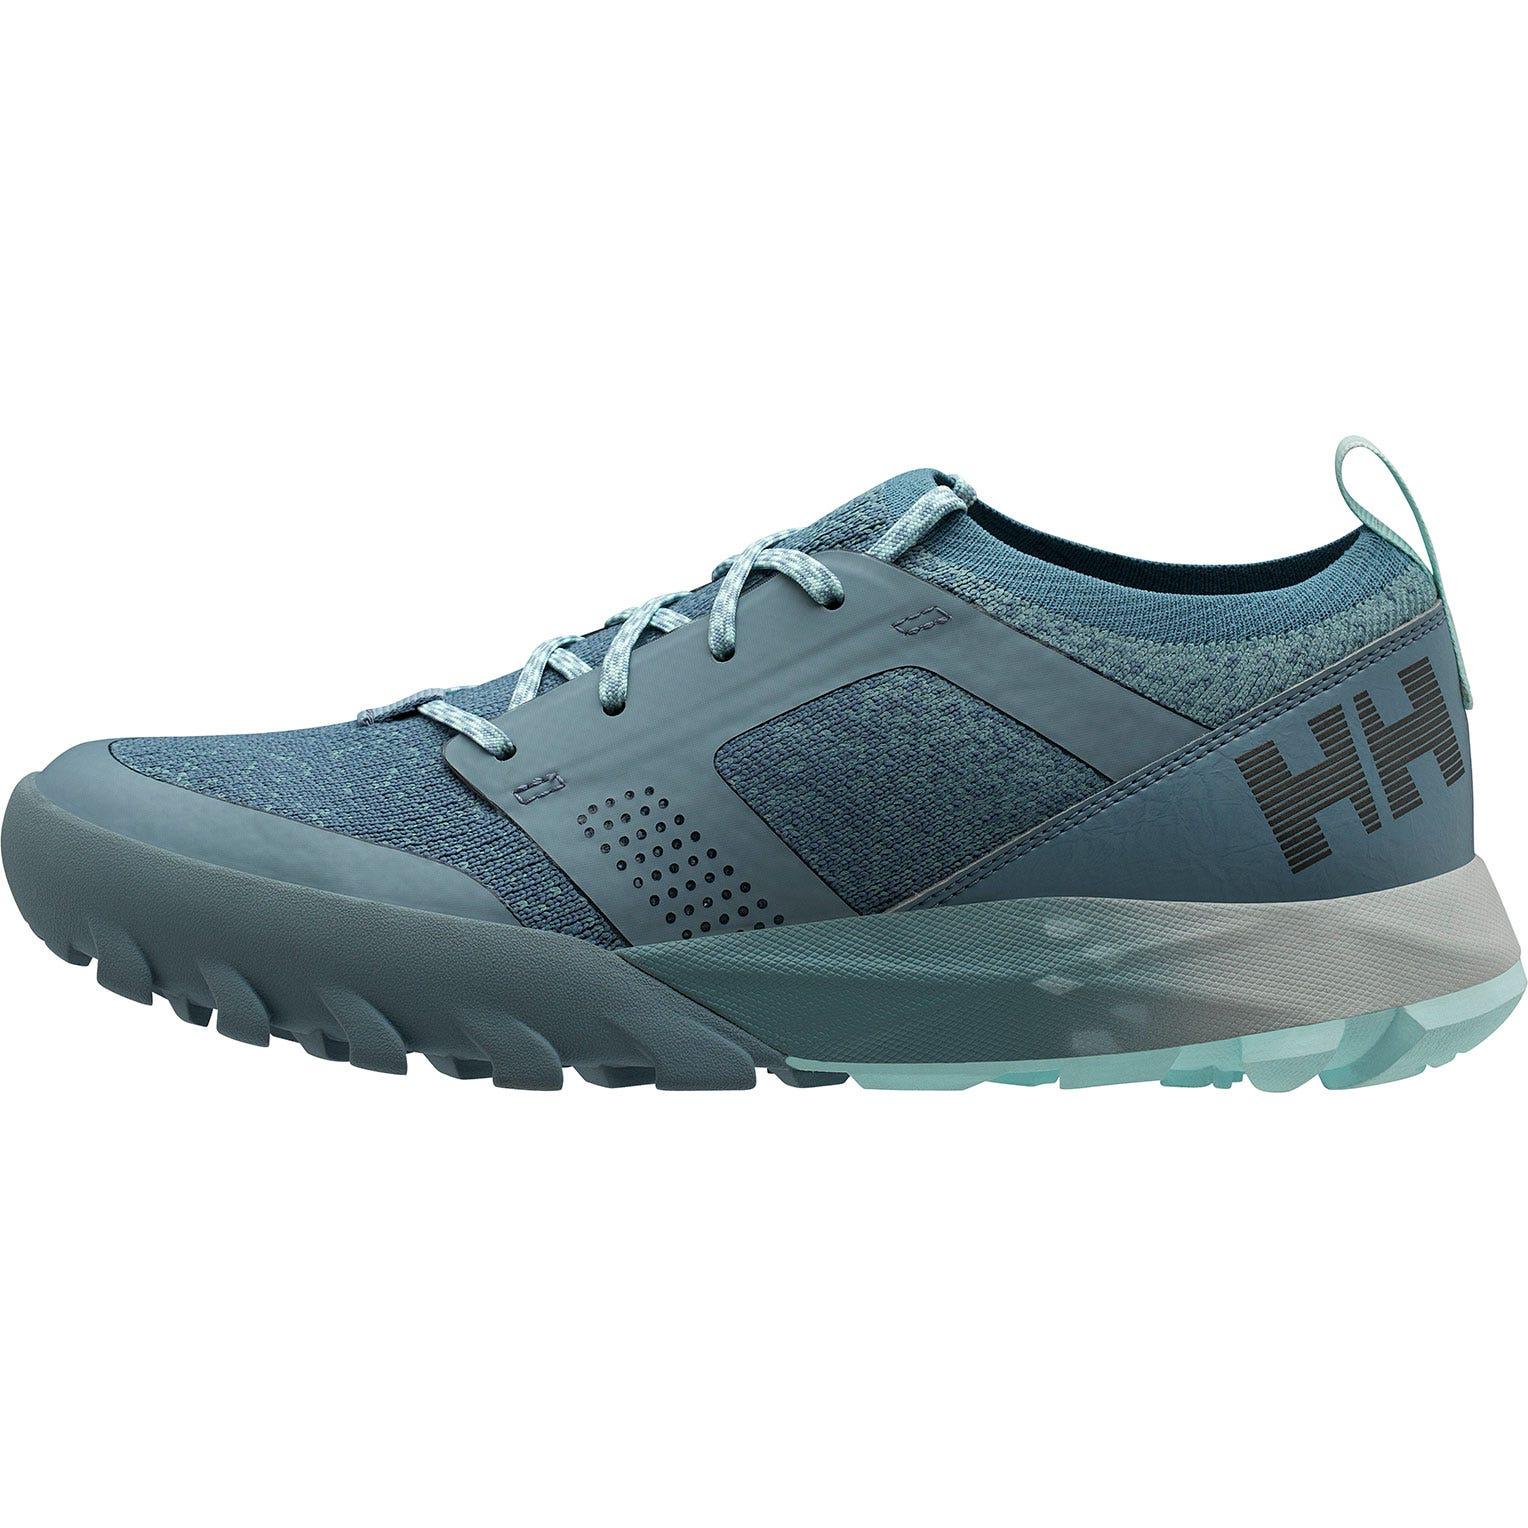 Helly Hansen W Loke Dash Womens Hiking Boot Blue 42/10